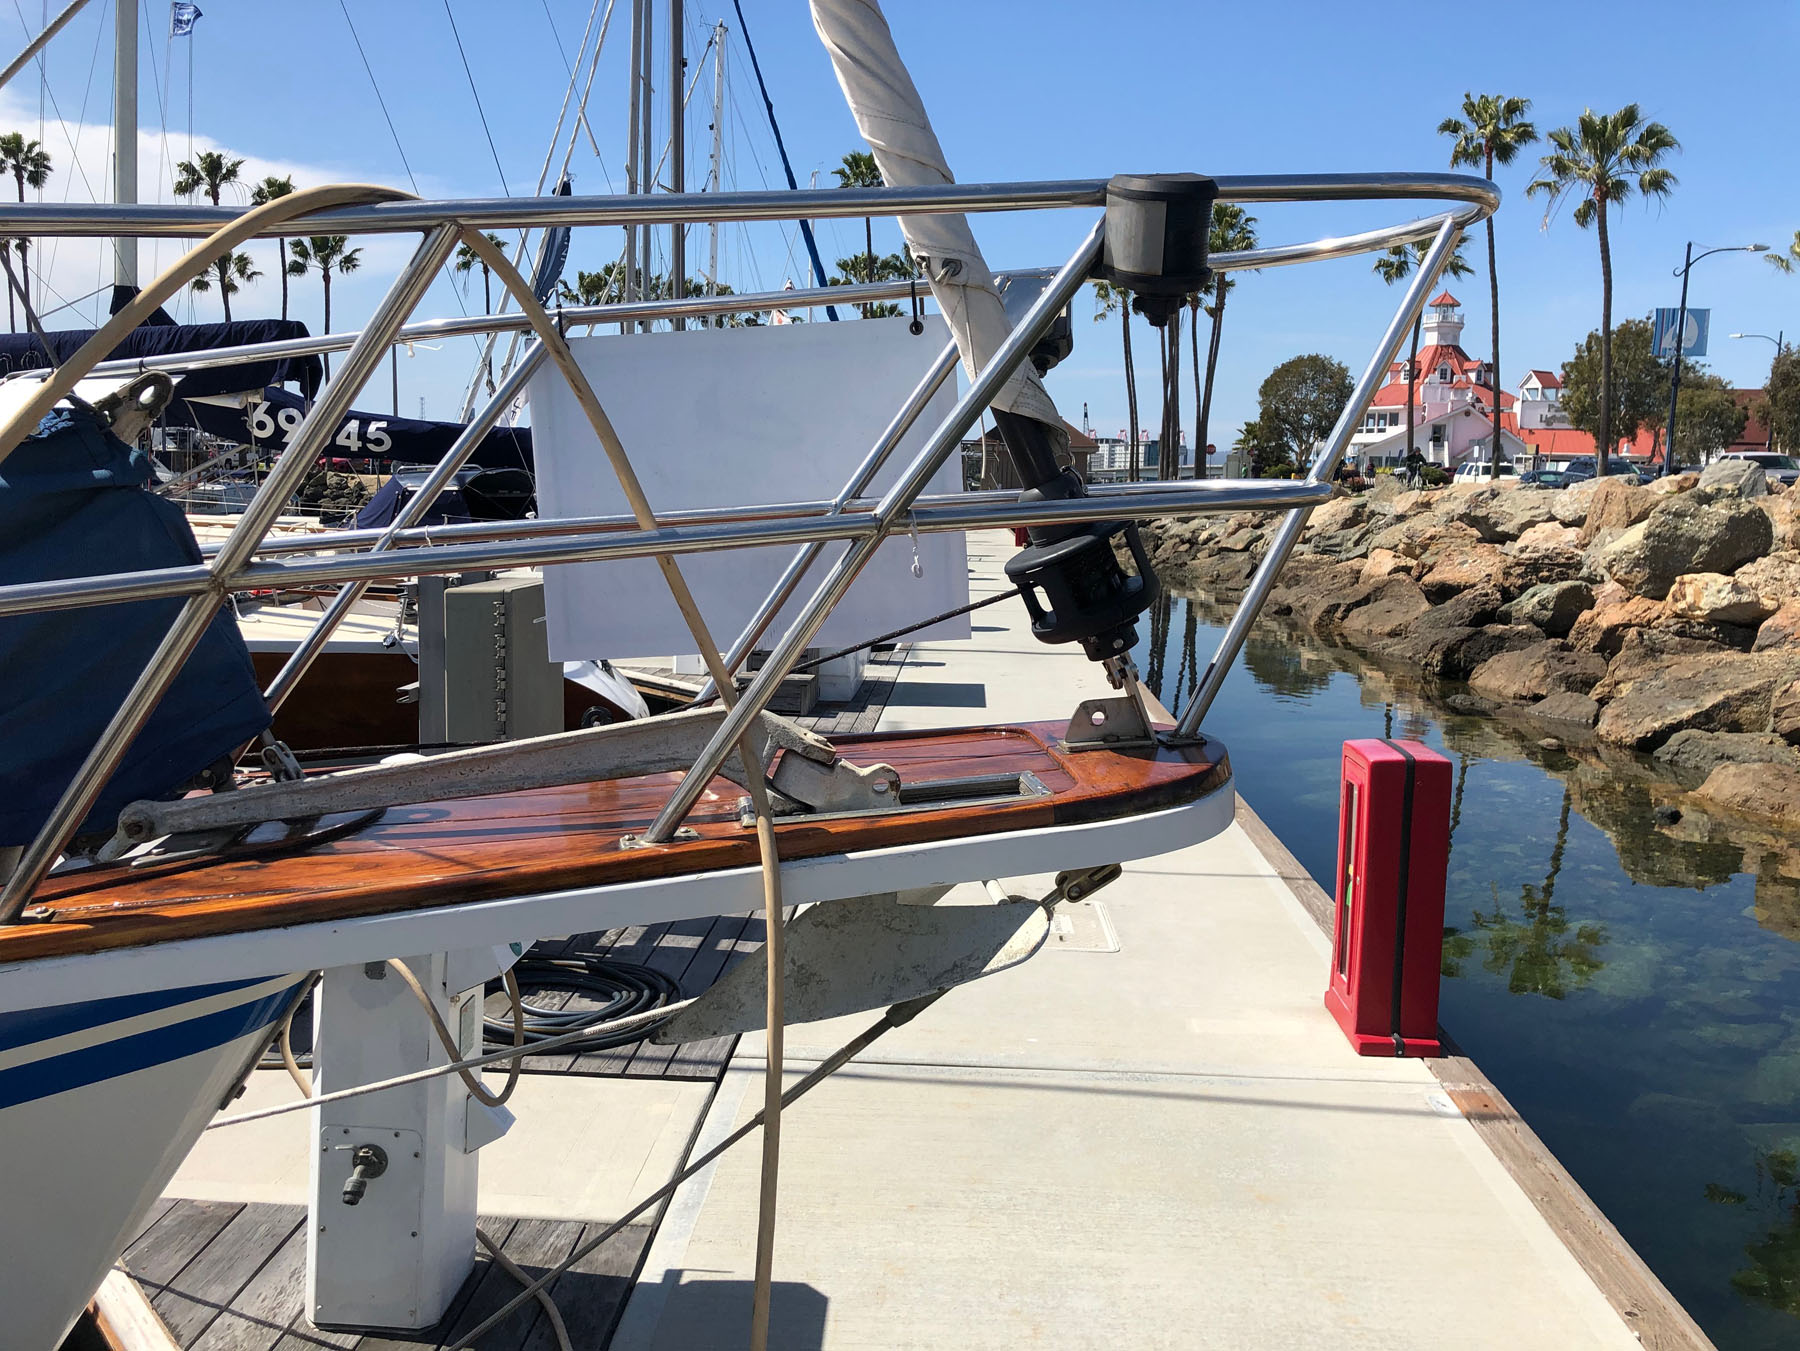 Dock Follies